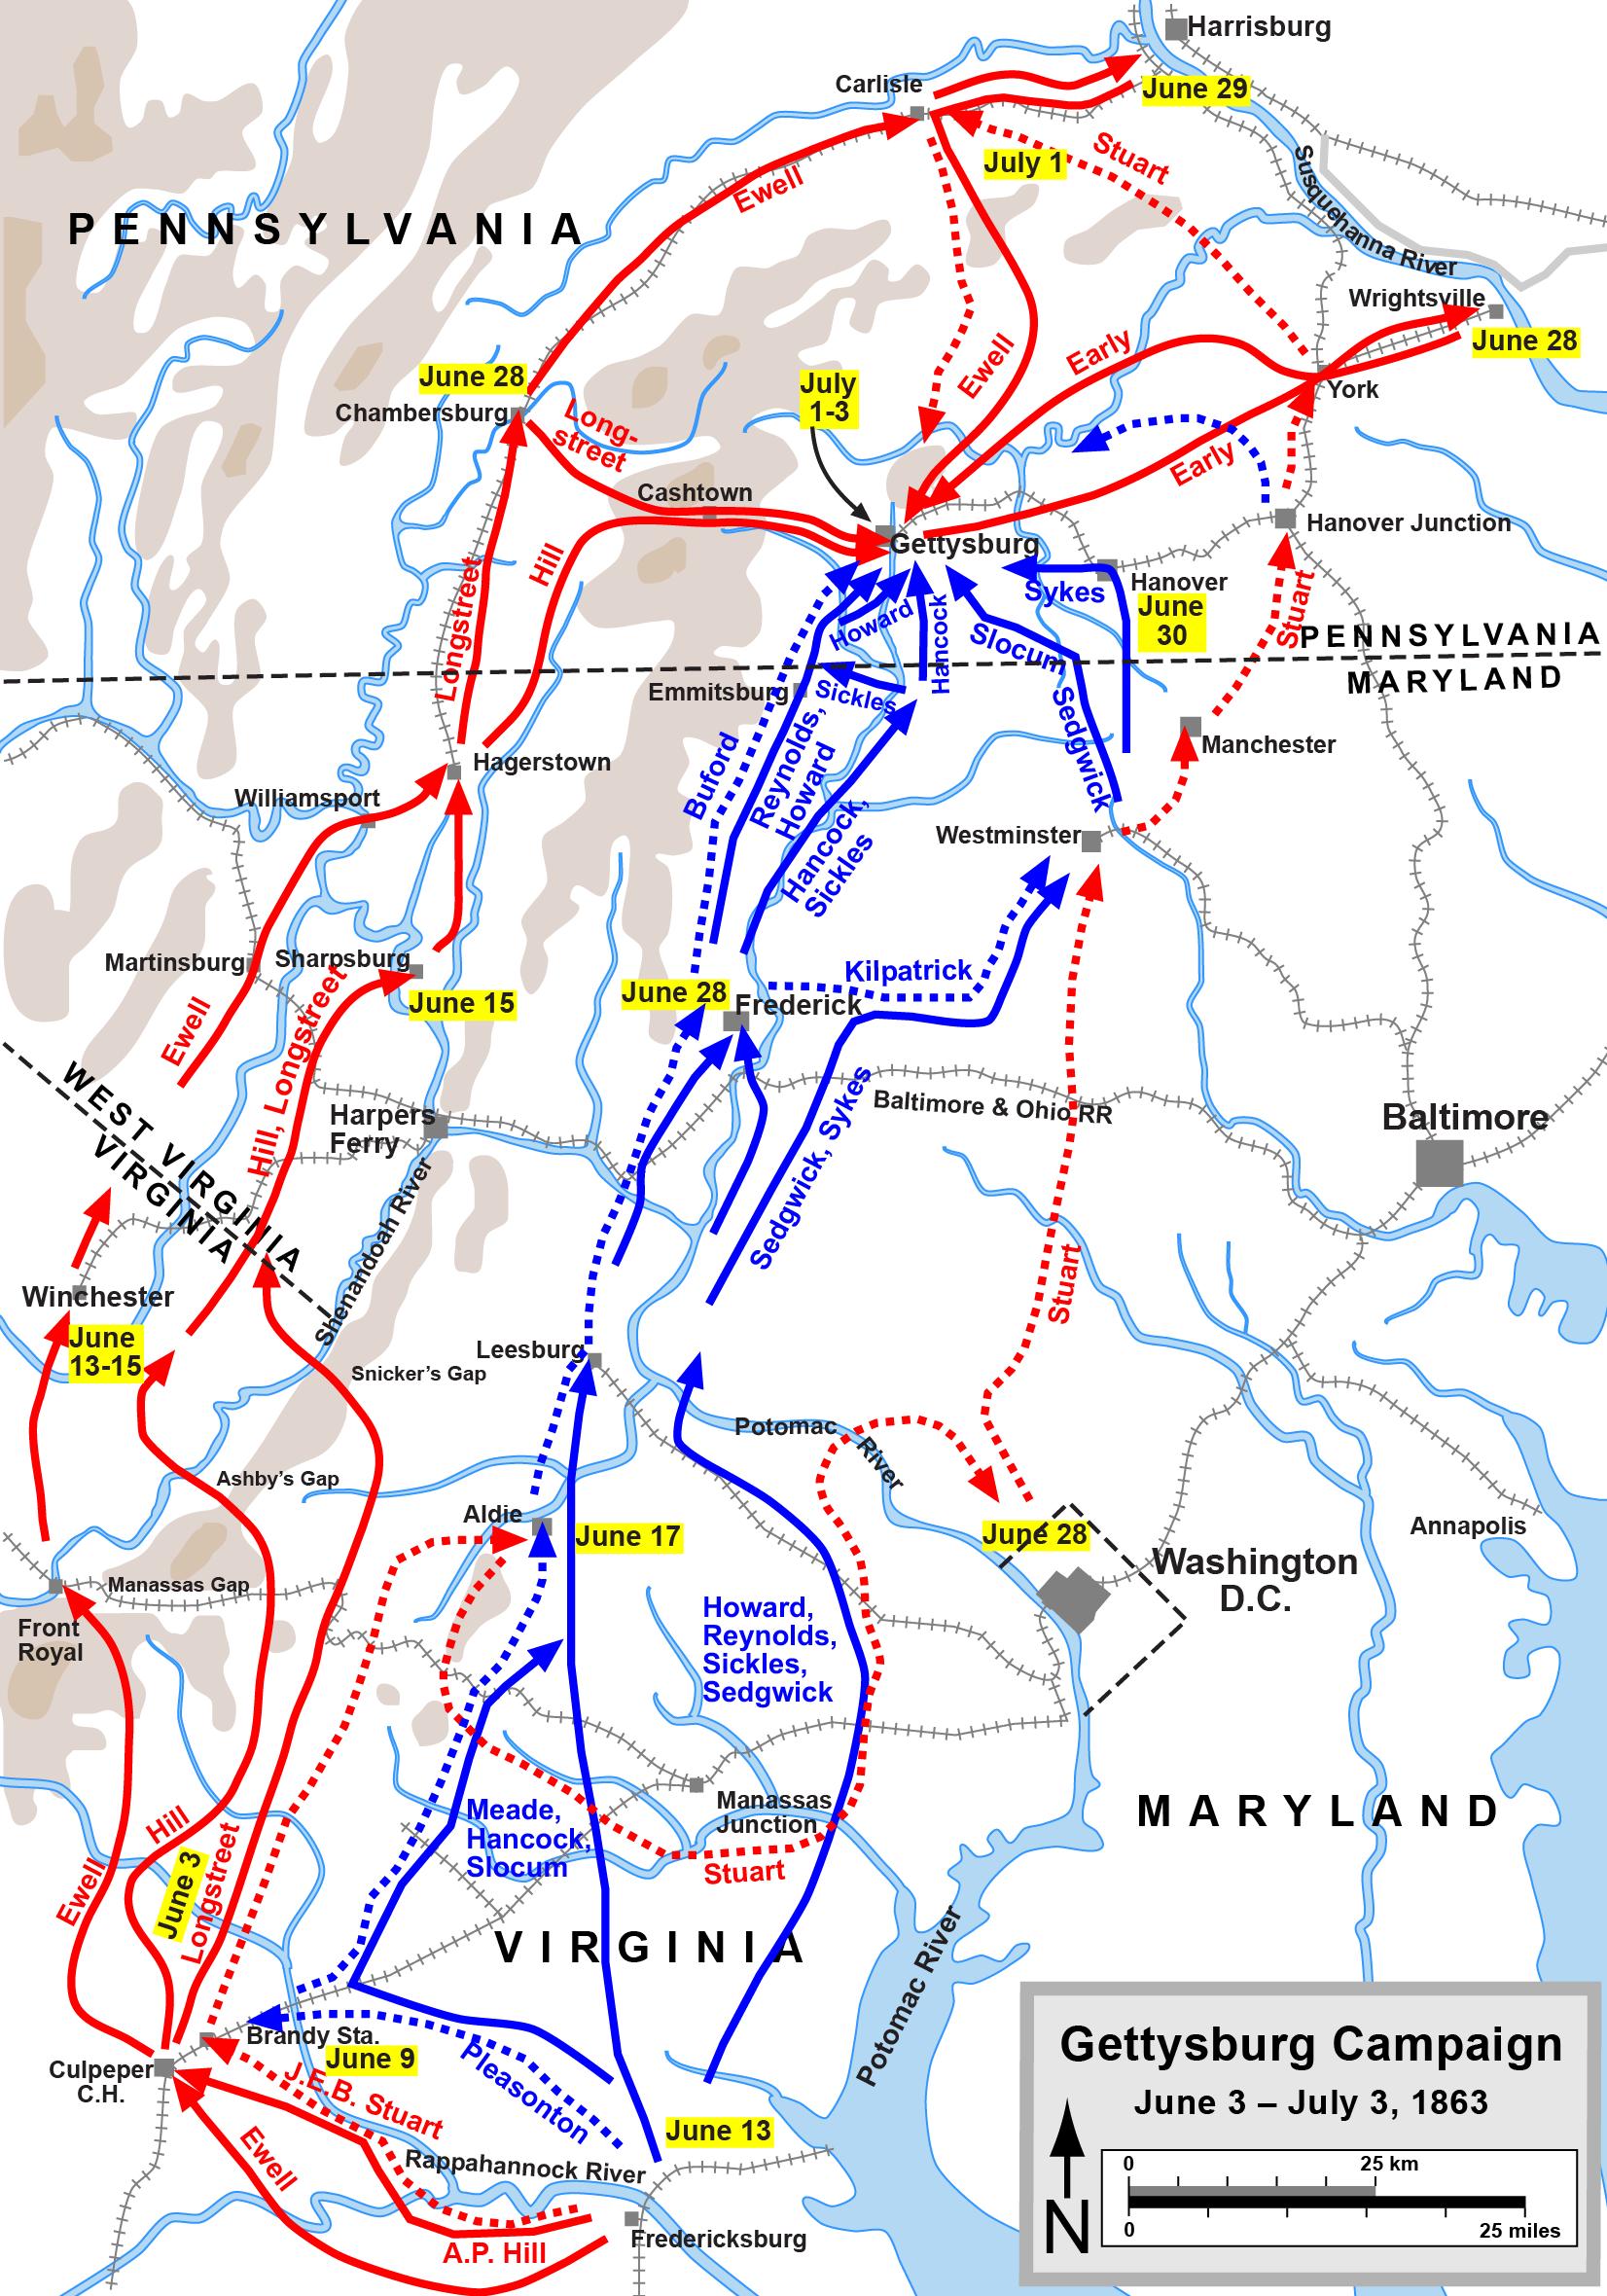 Maps That Explain The American Civil War Gettysburg Civil - Gettysburg battle us map